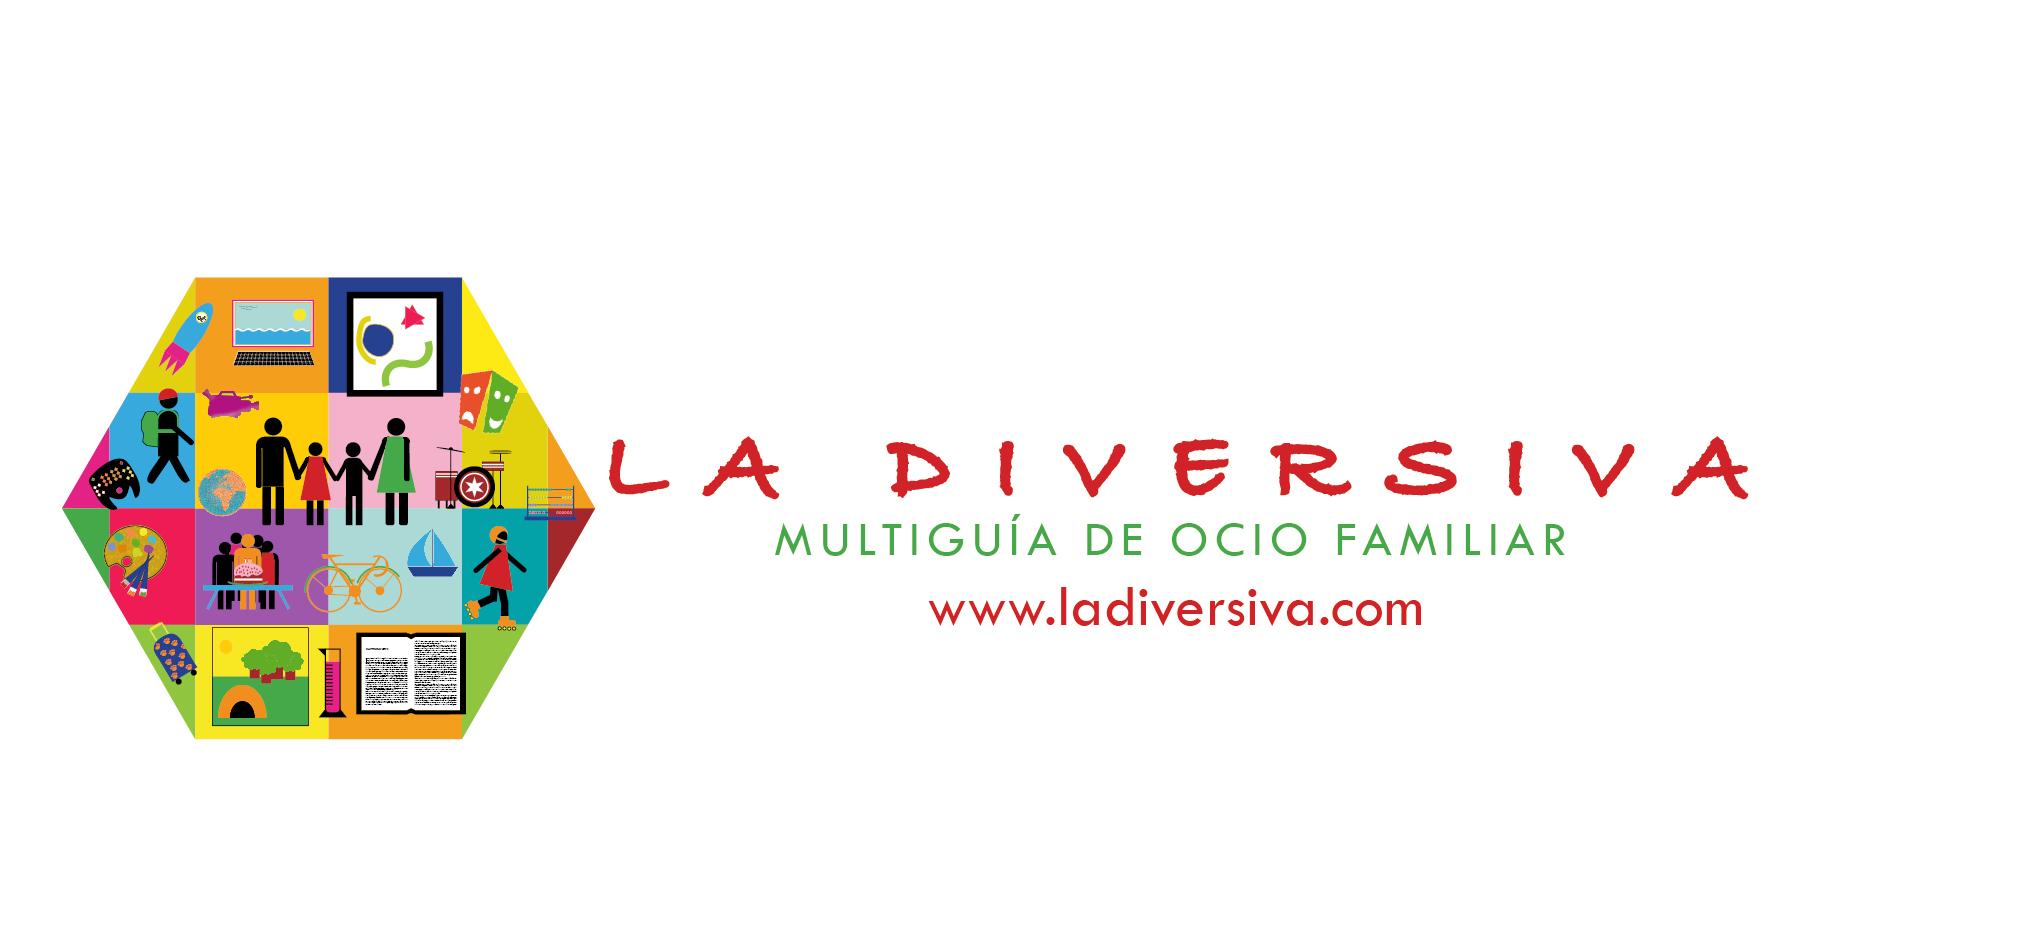 LOGO_DIVERSIVA_H